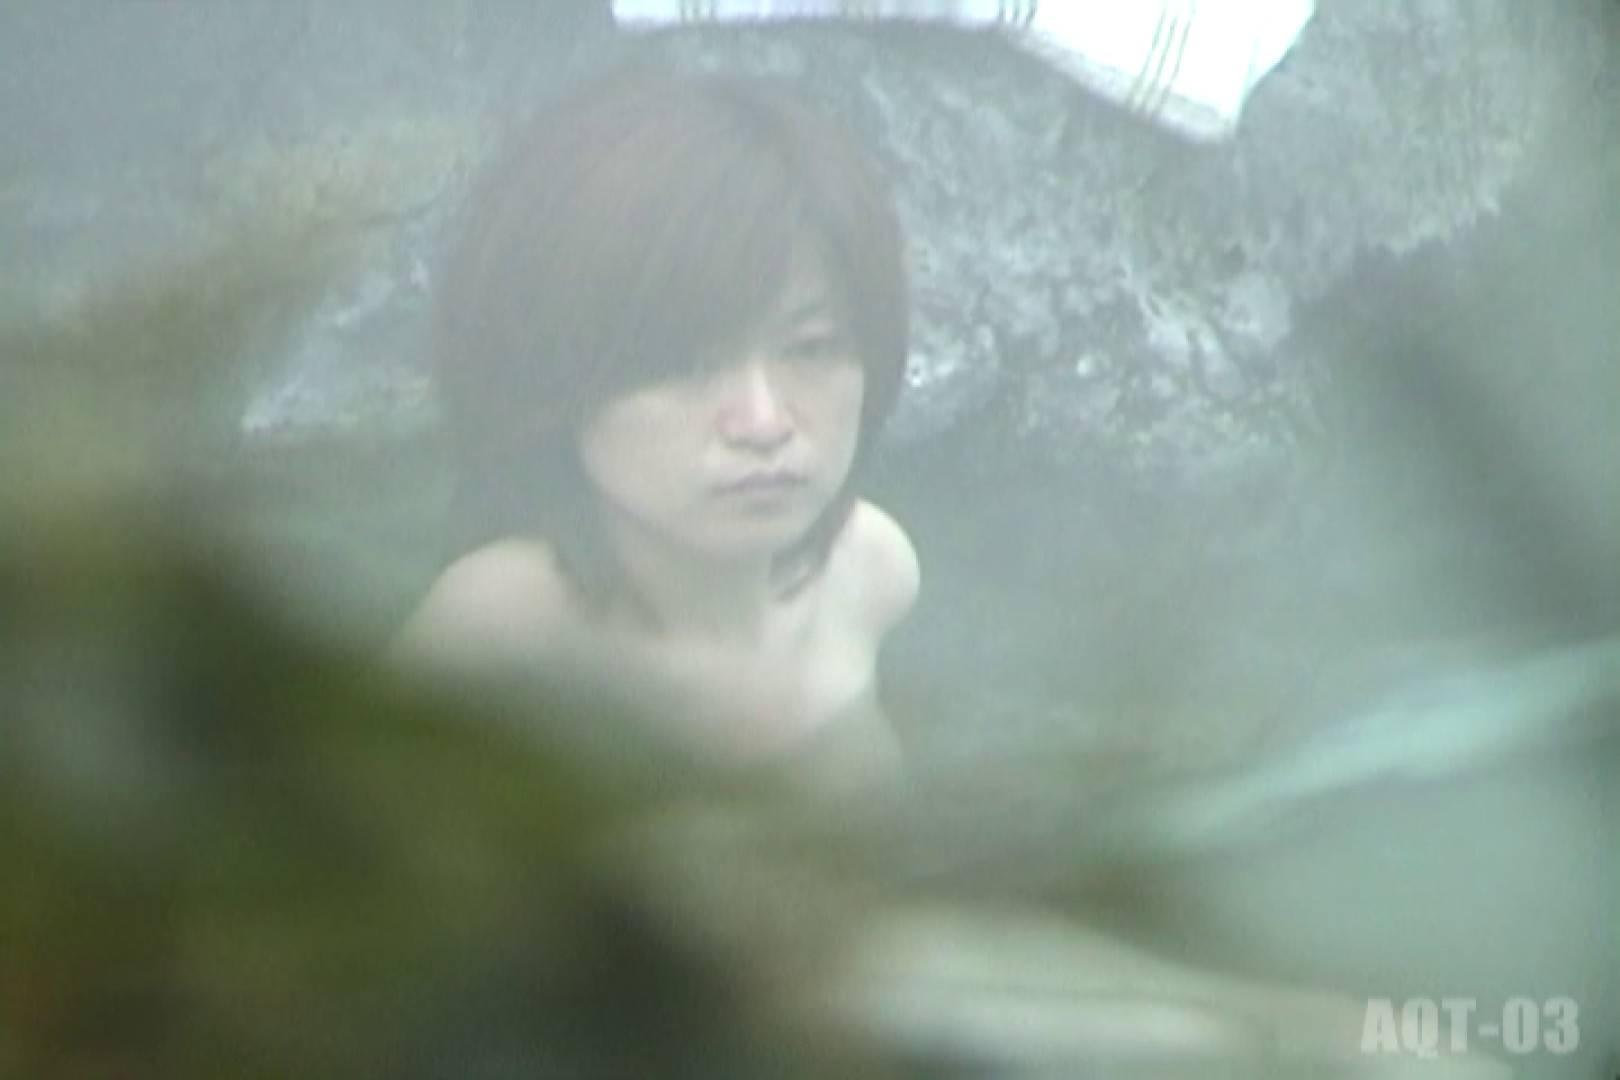 Aquaな露天風呂Vol.731 盗撮師作品  91pic 36